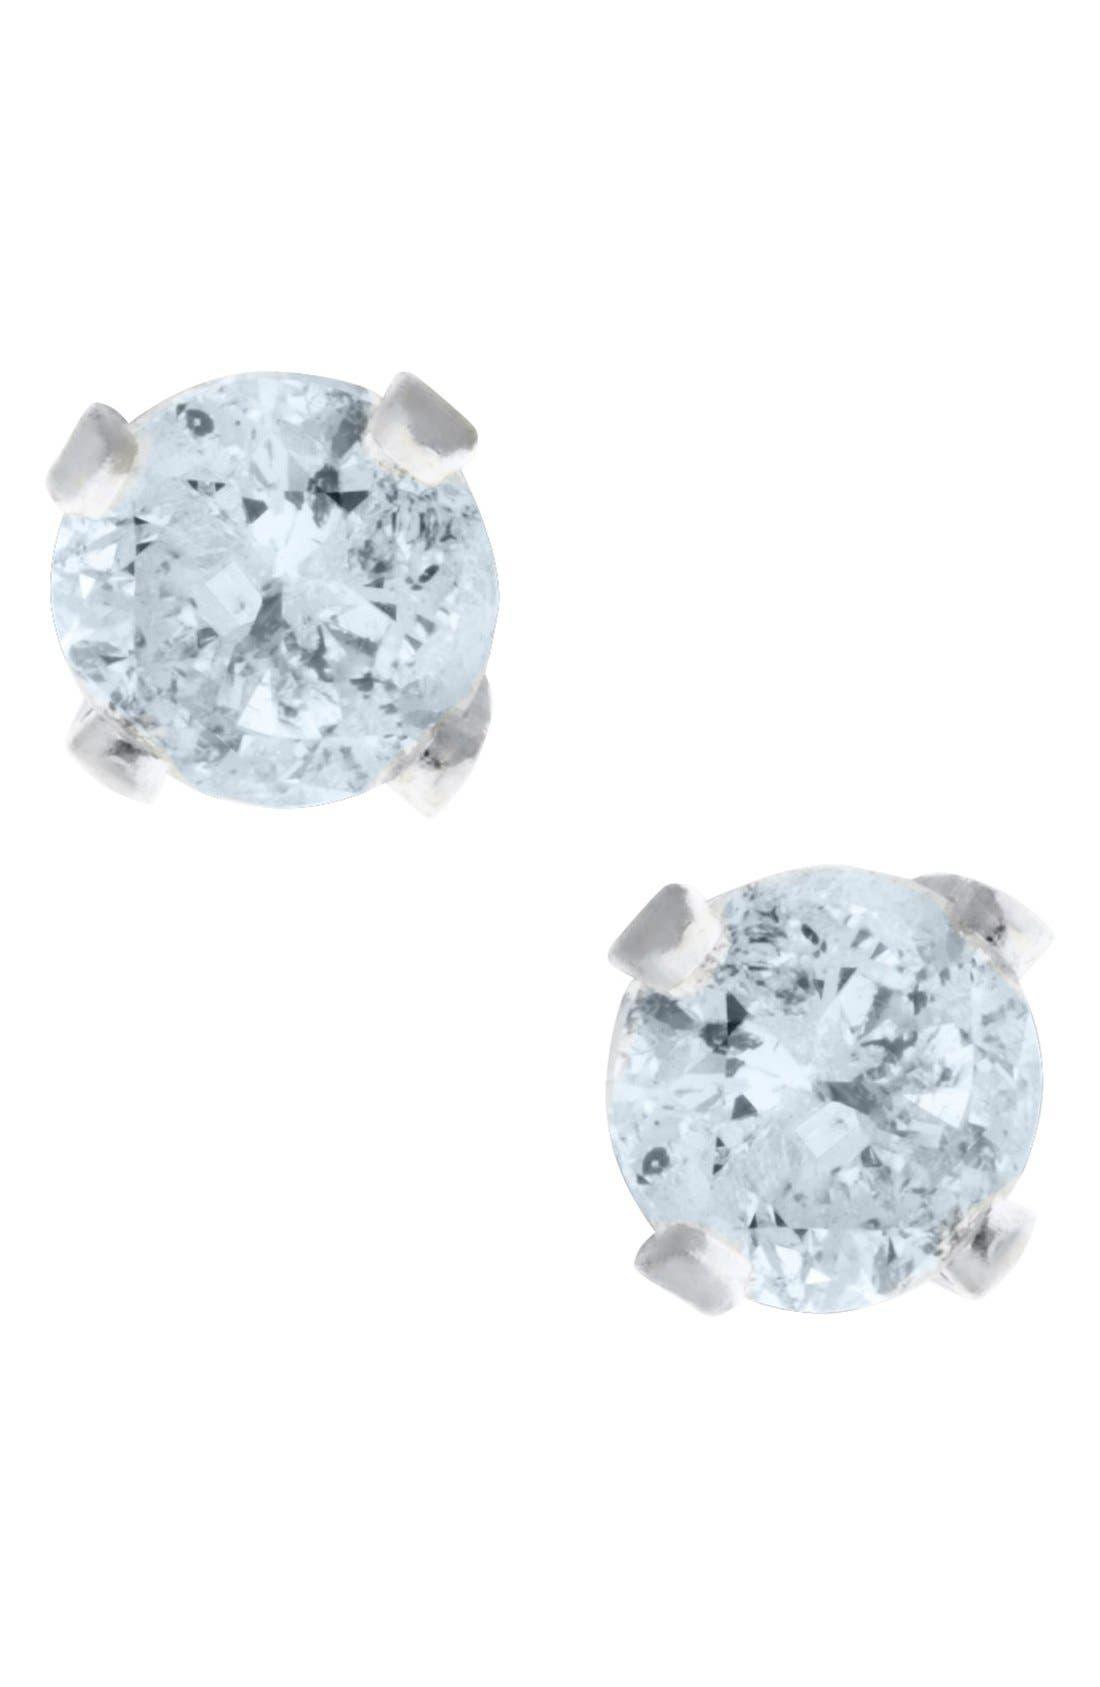 14k White Gold & Diamond Stud Earrings,                         Main,                         color, SILVER